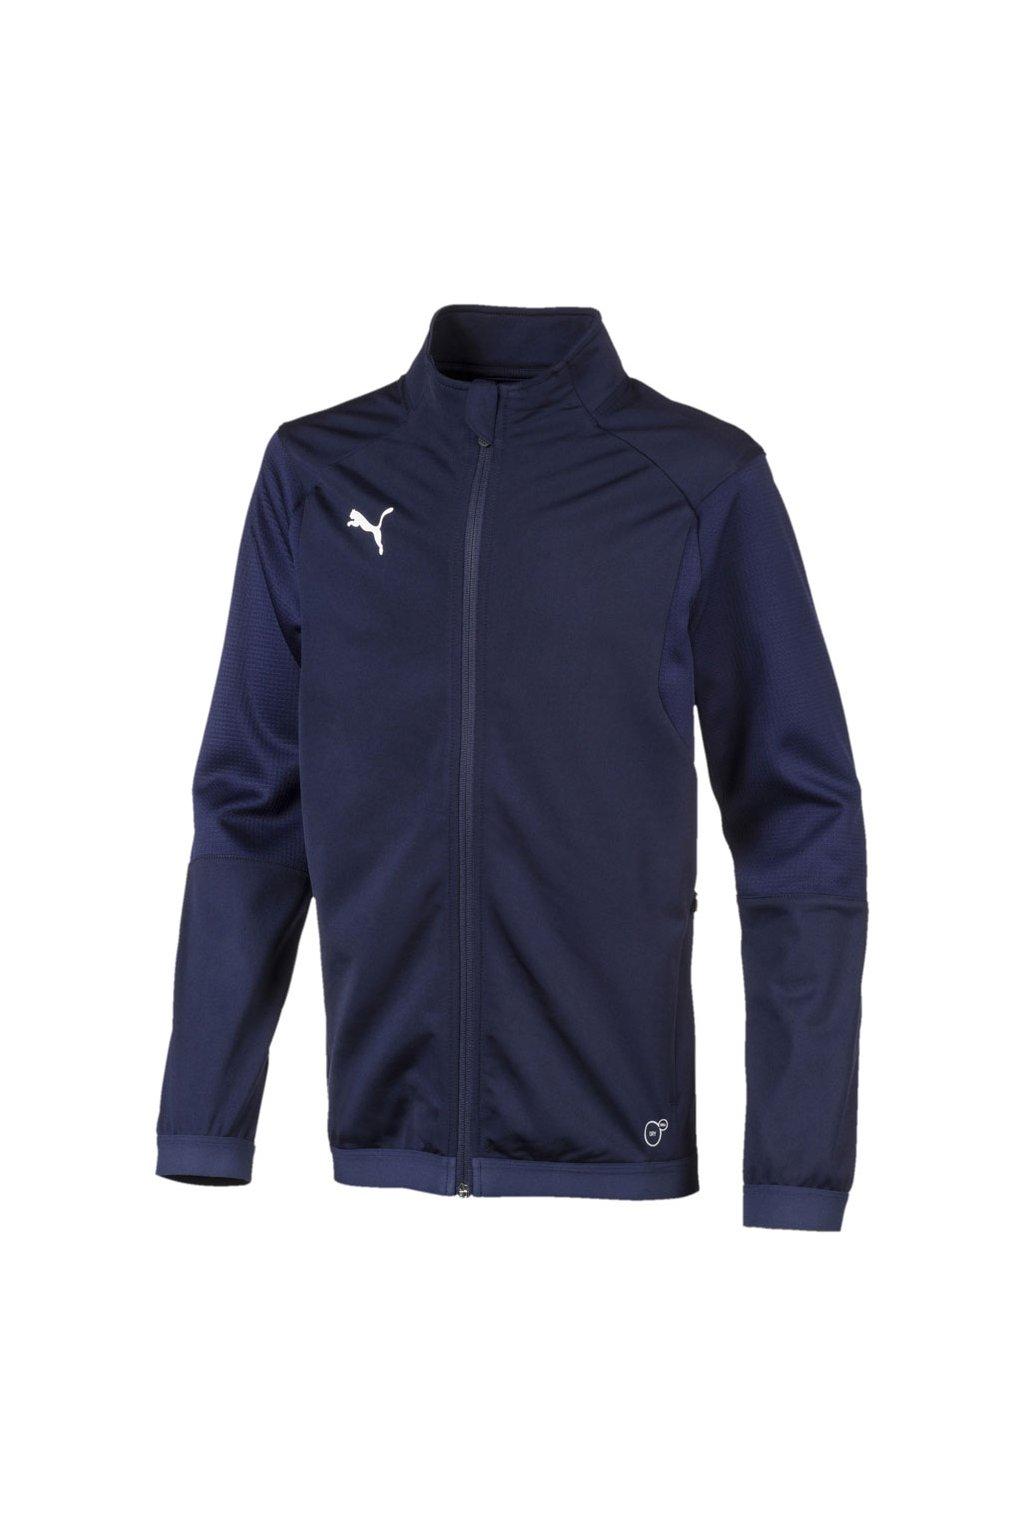 Detská mikina Puma Liga Training Jacket JUNIOR tmavo modrá 655688 06